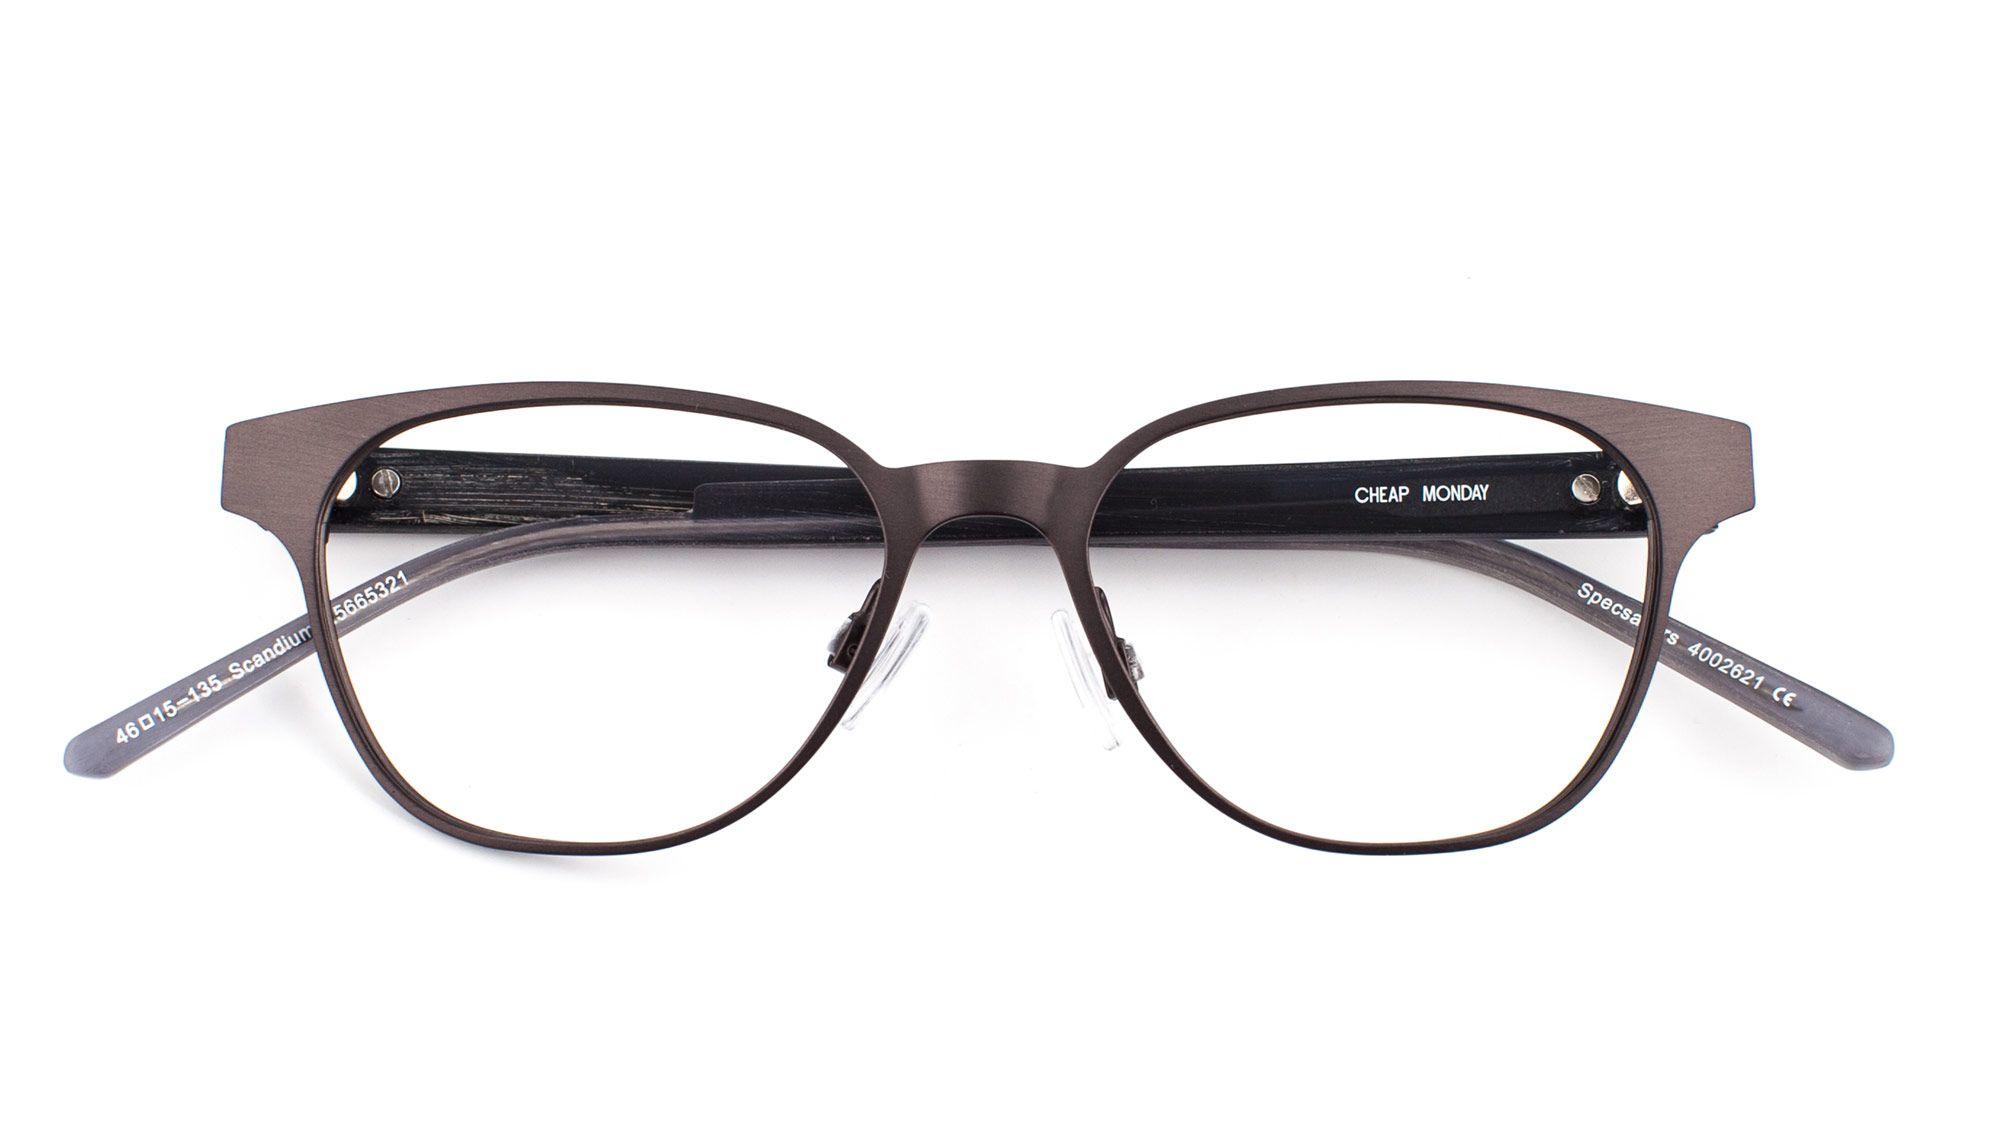 33c7a1cd64316 SCANDIUM Glasses by Cheap Monday